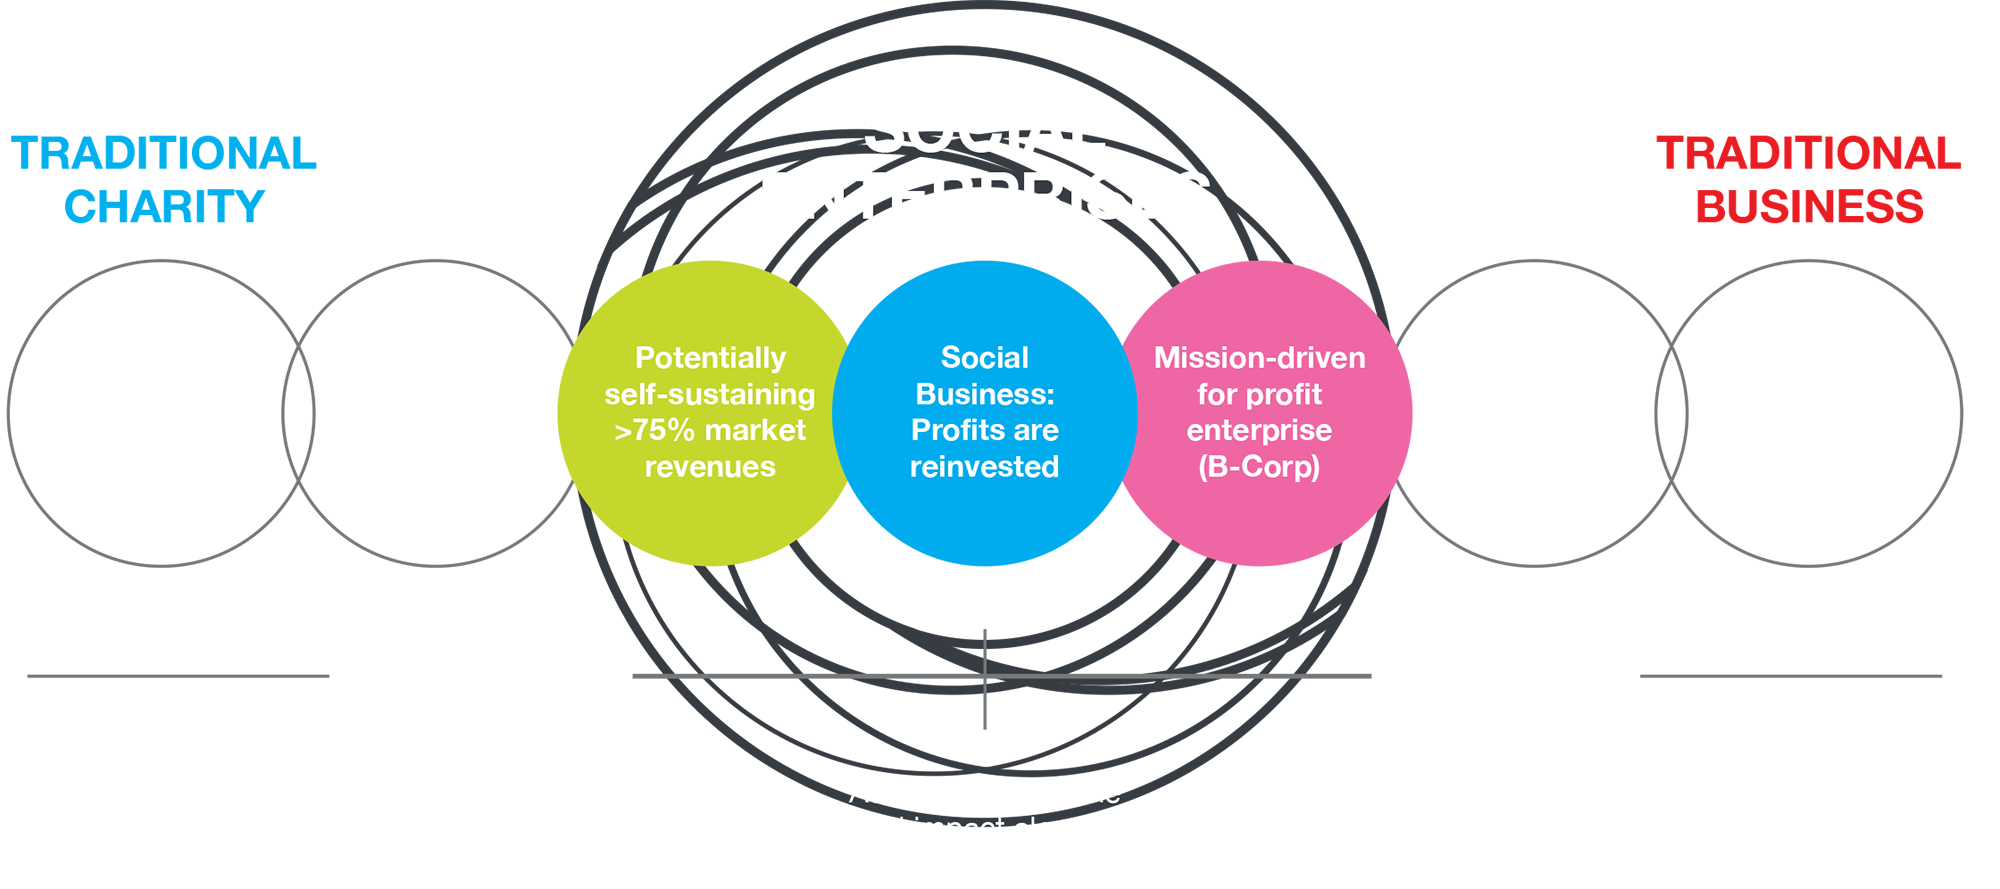 Home seam. Missions clipart social enterprise